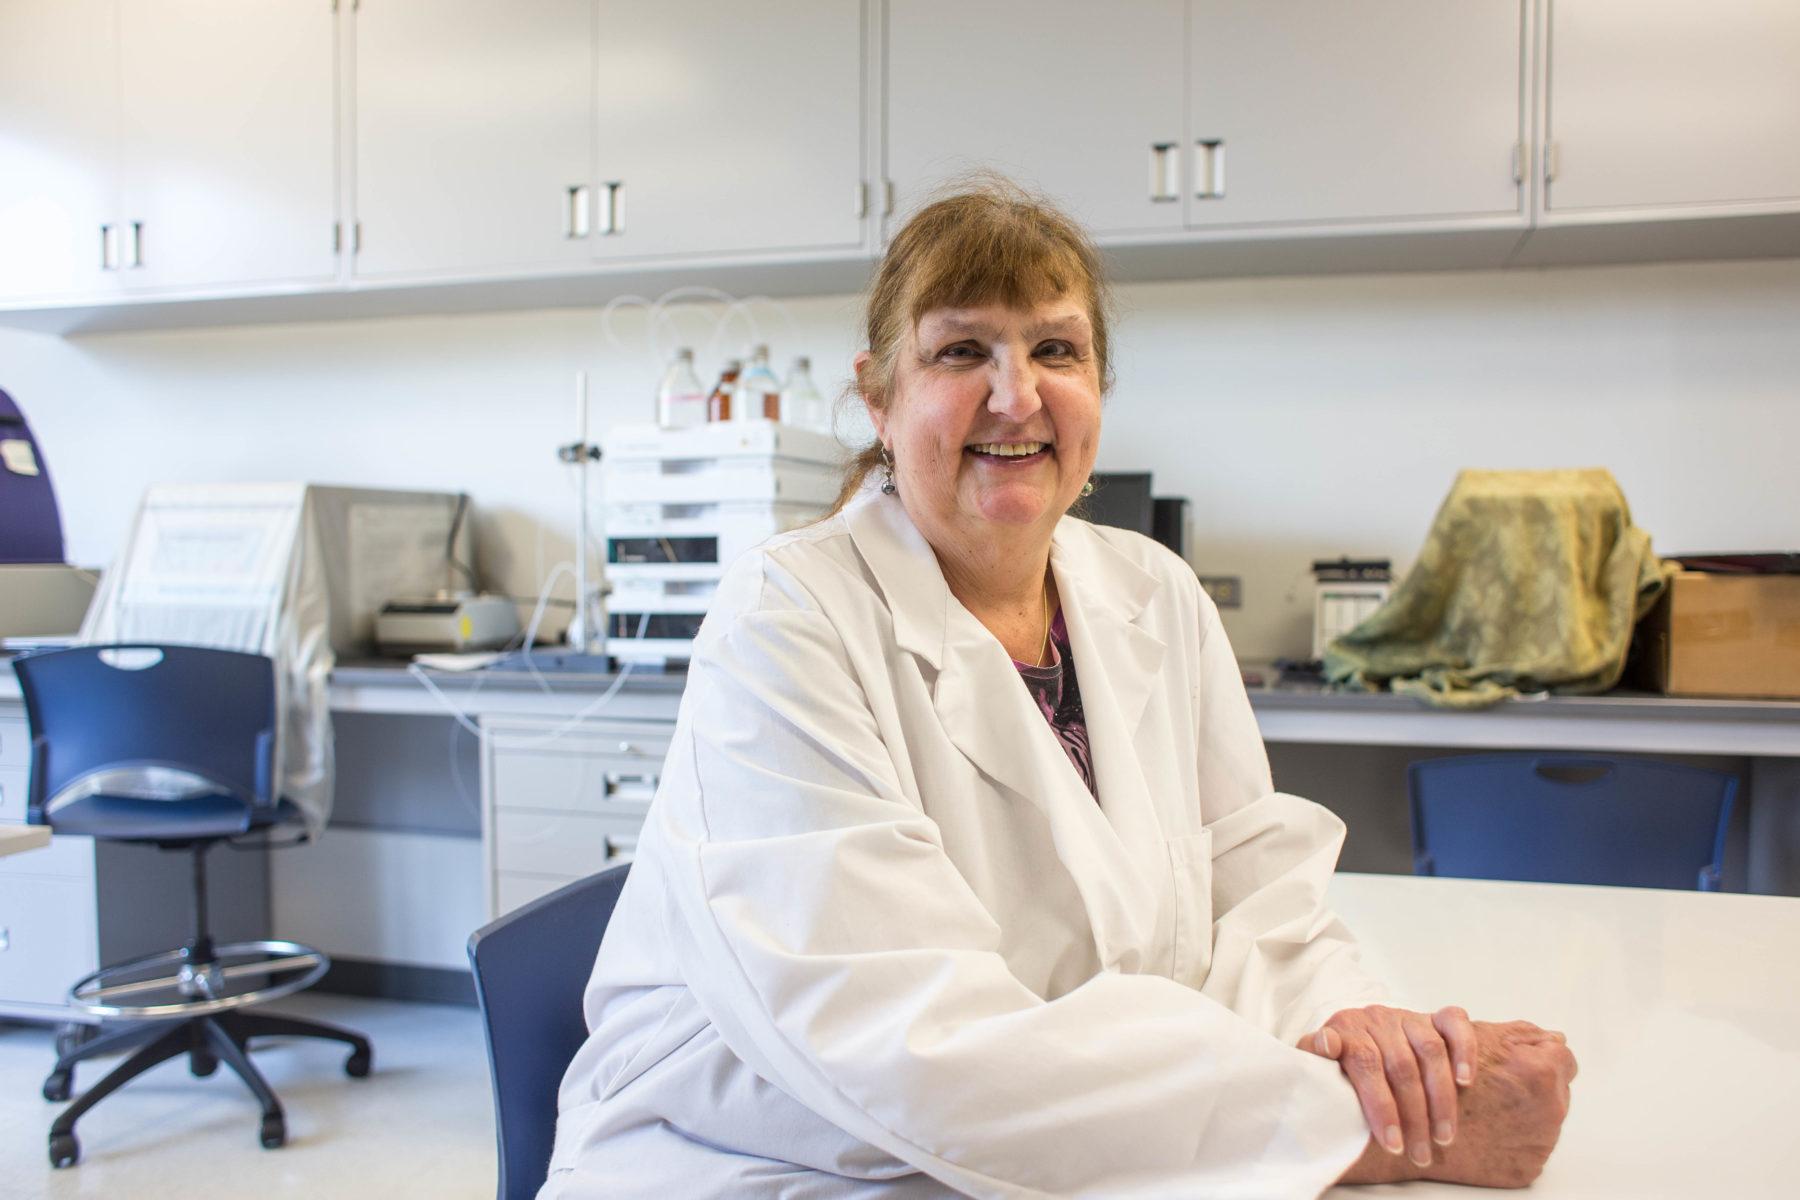 Dr. Karlesky in the lab